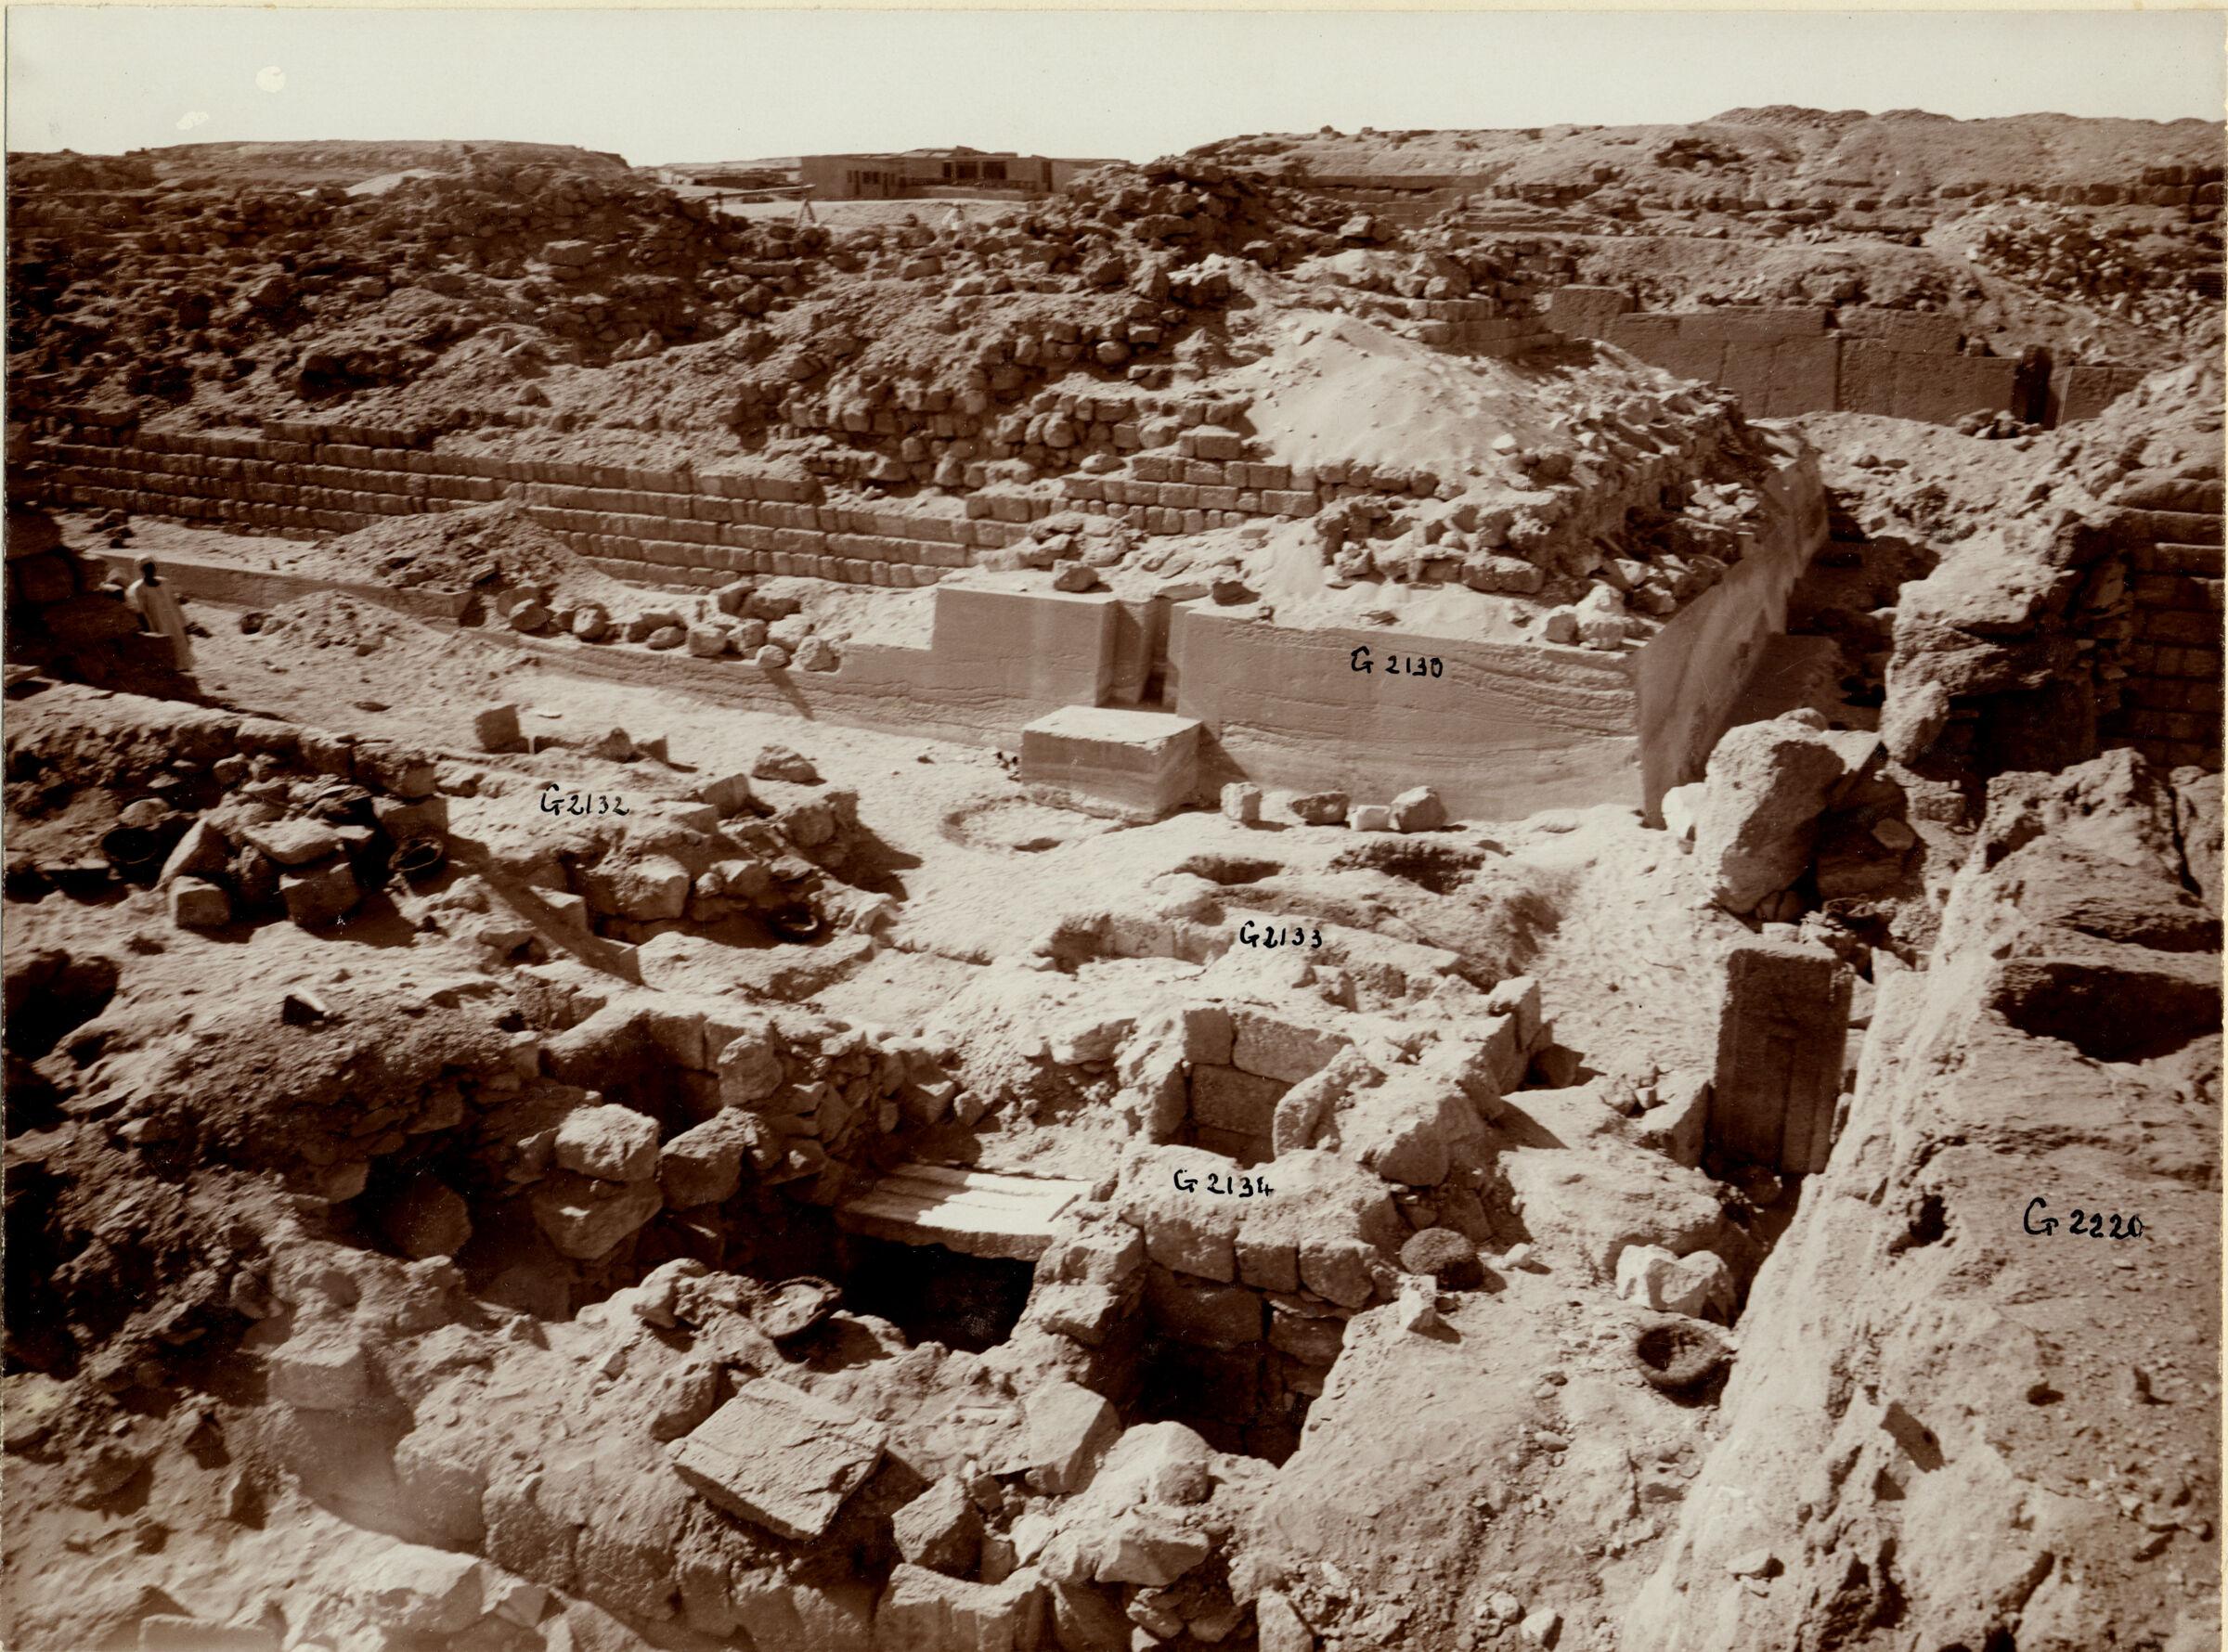 Western Cemetery: Site: Giza; View: G 2220, G 2134, G 2133, G 2132, G 2131, G 2130